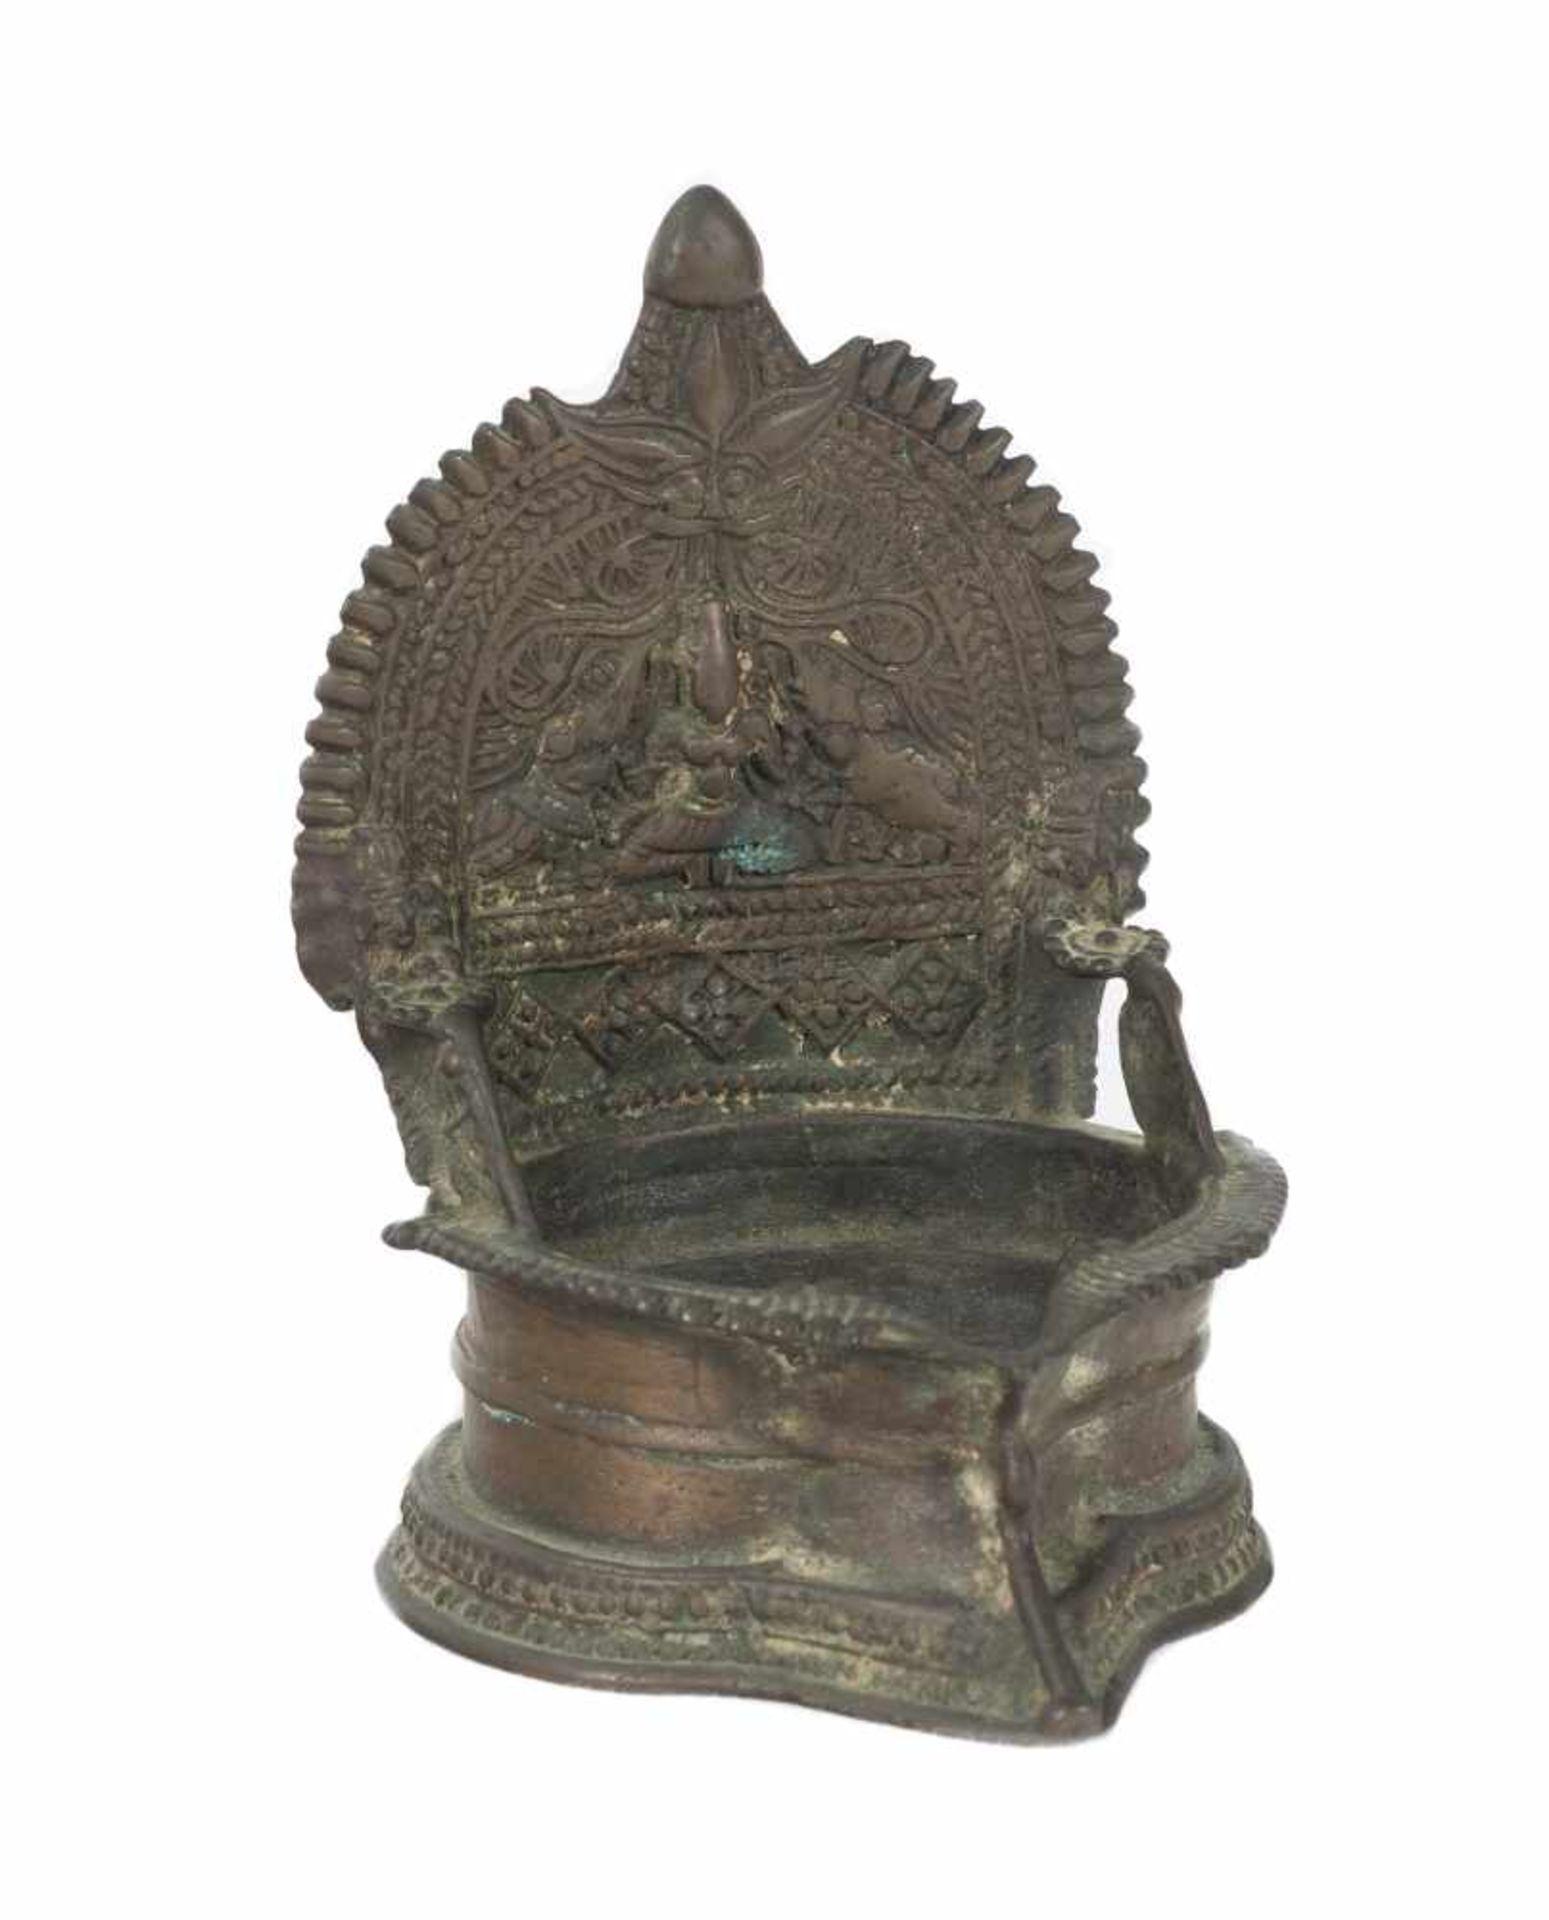 Los 57 - An 18th century Indian bronze oil lamp for offerings depicting Gajalakshmi (Lakshmi with